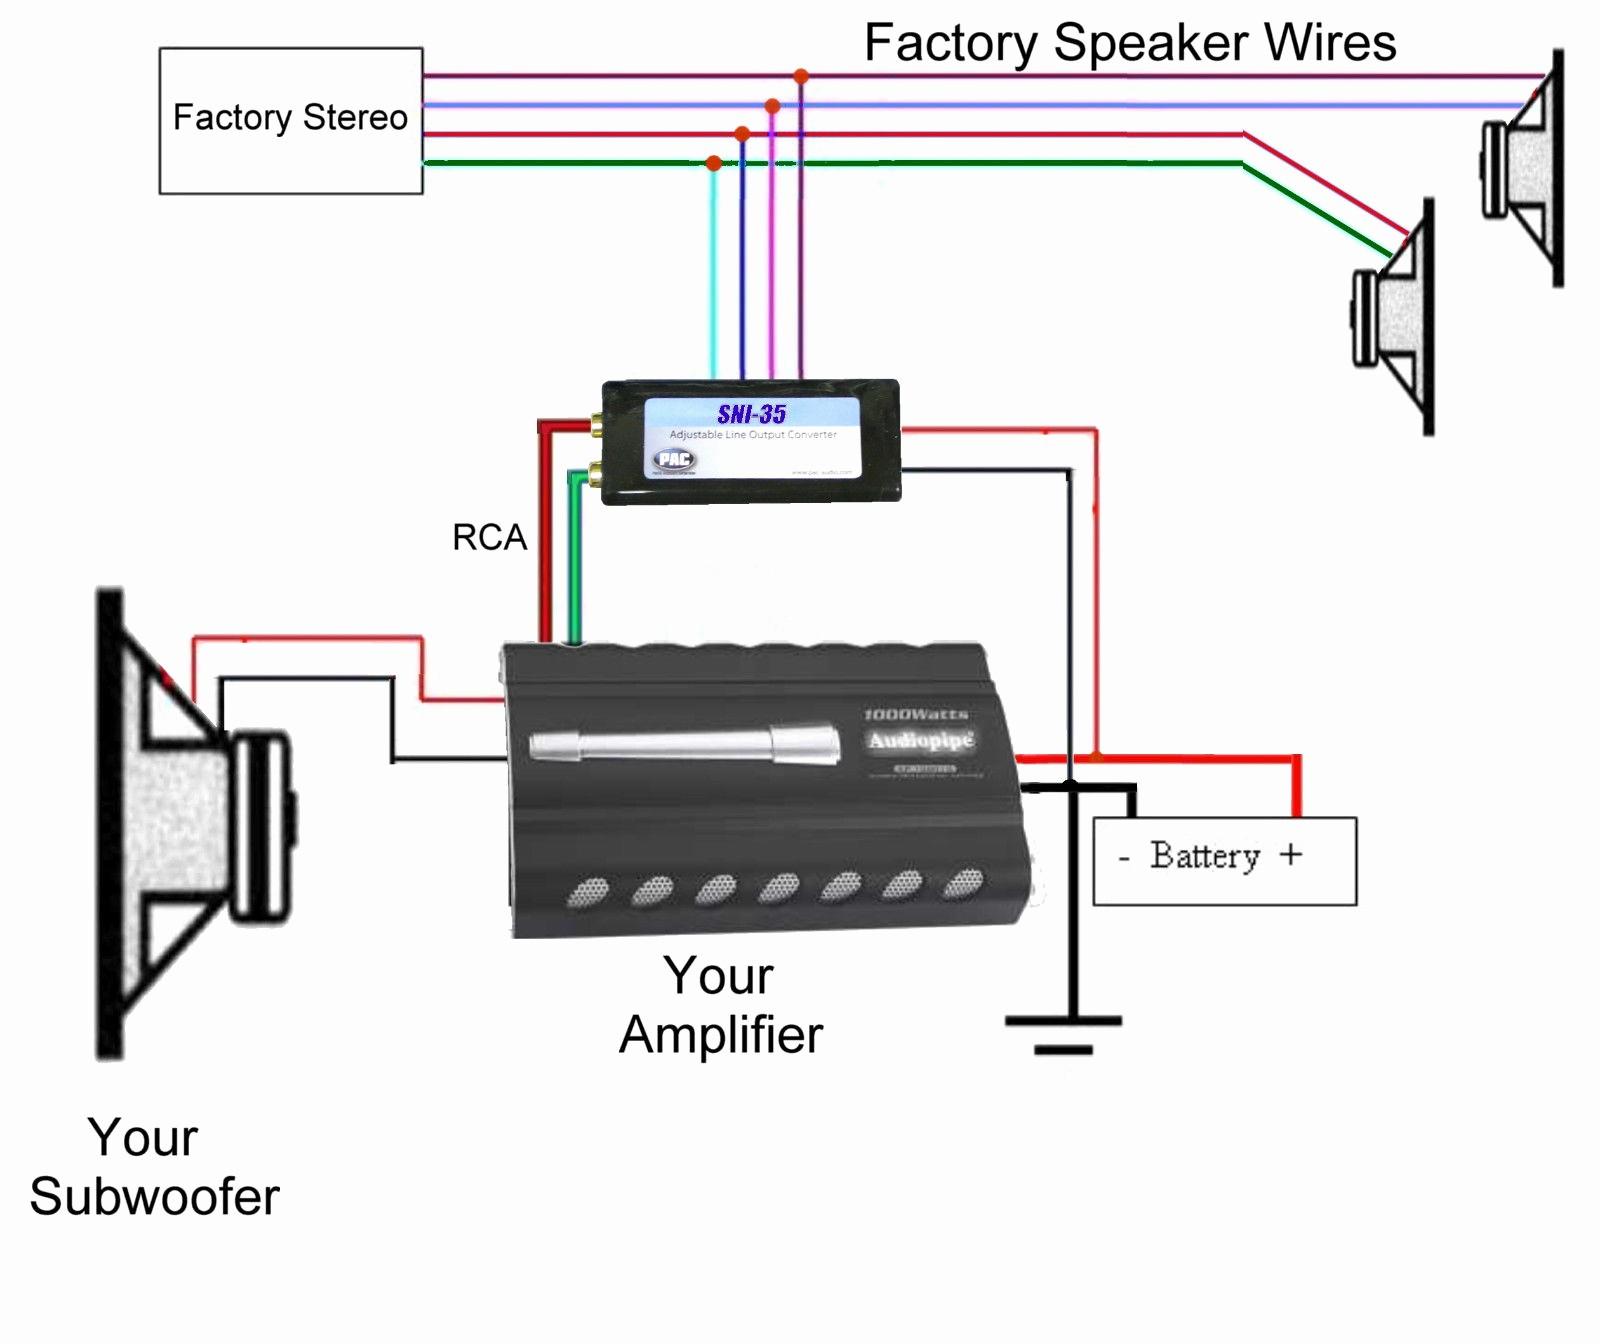 pac 80 wiring diagram ac motor run capacitor sni 35 adjustable line output converter